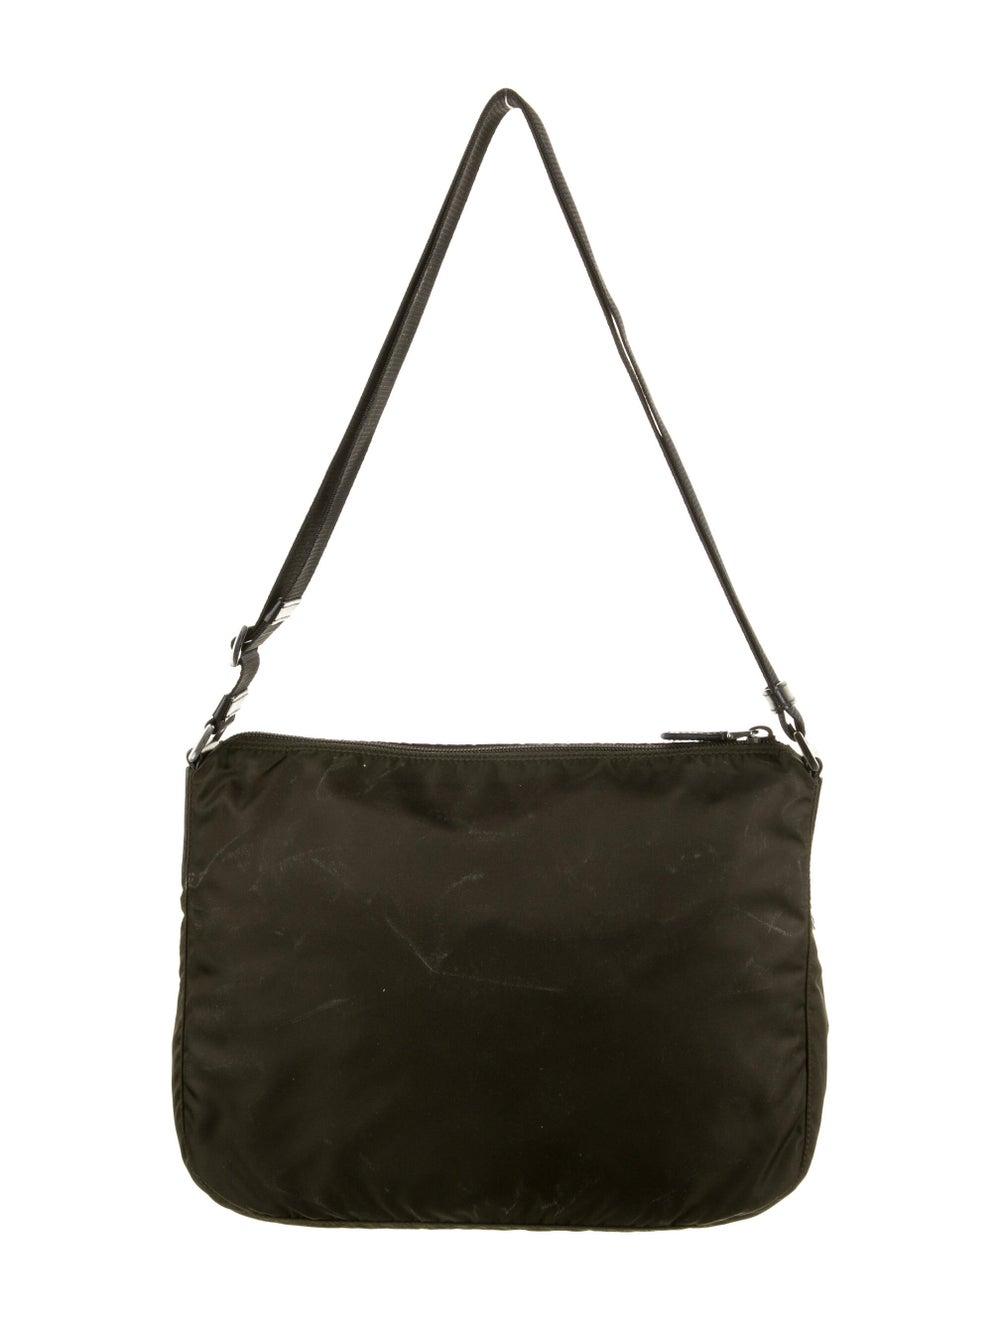 Prada Tessuto Messenger Bag Green - image 4